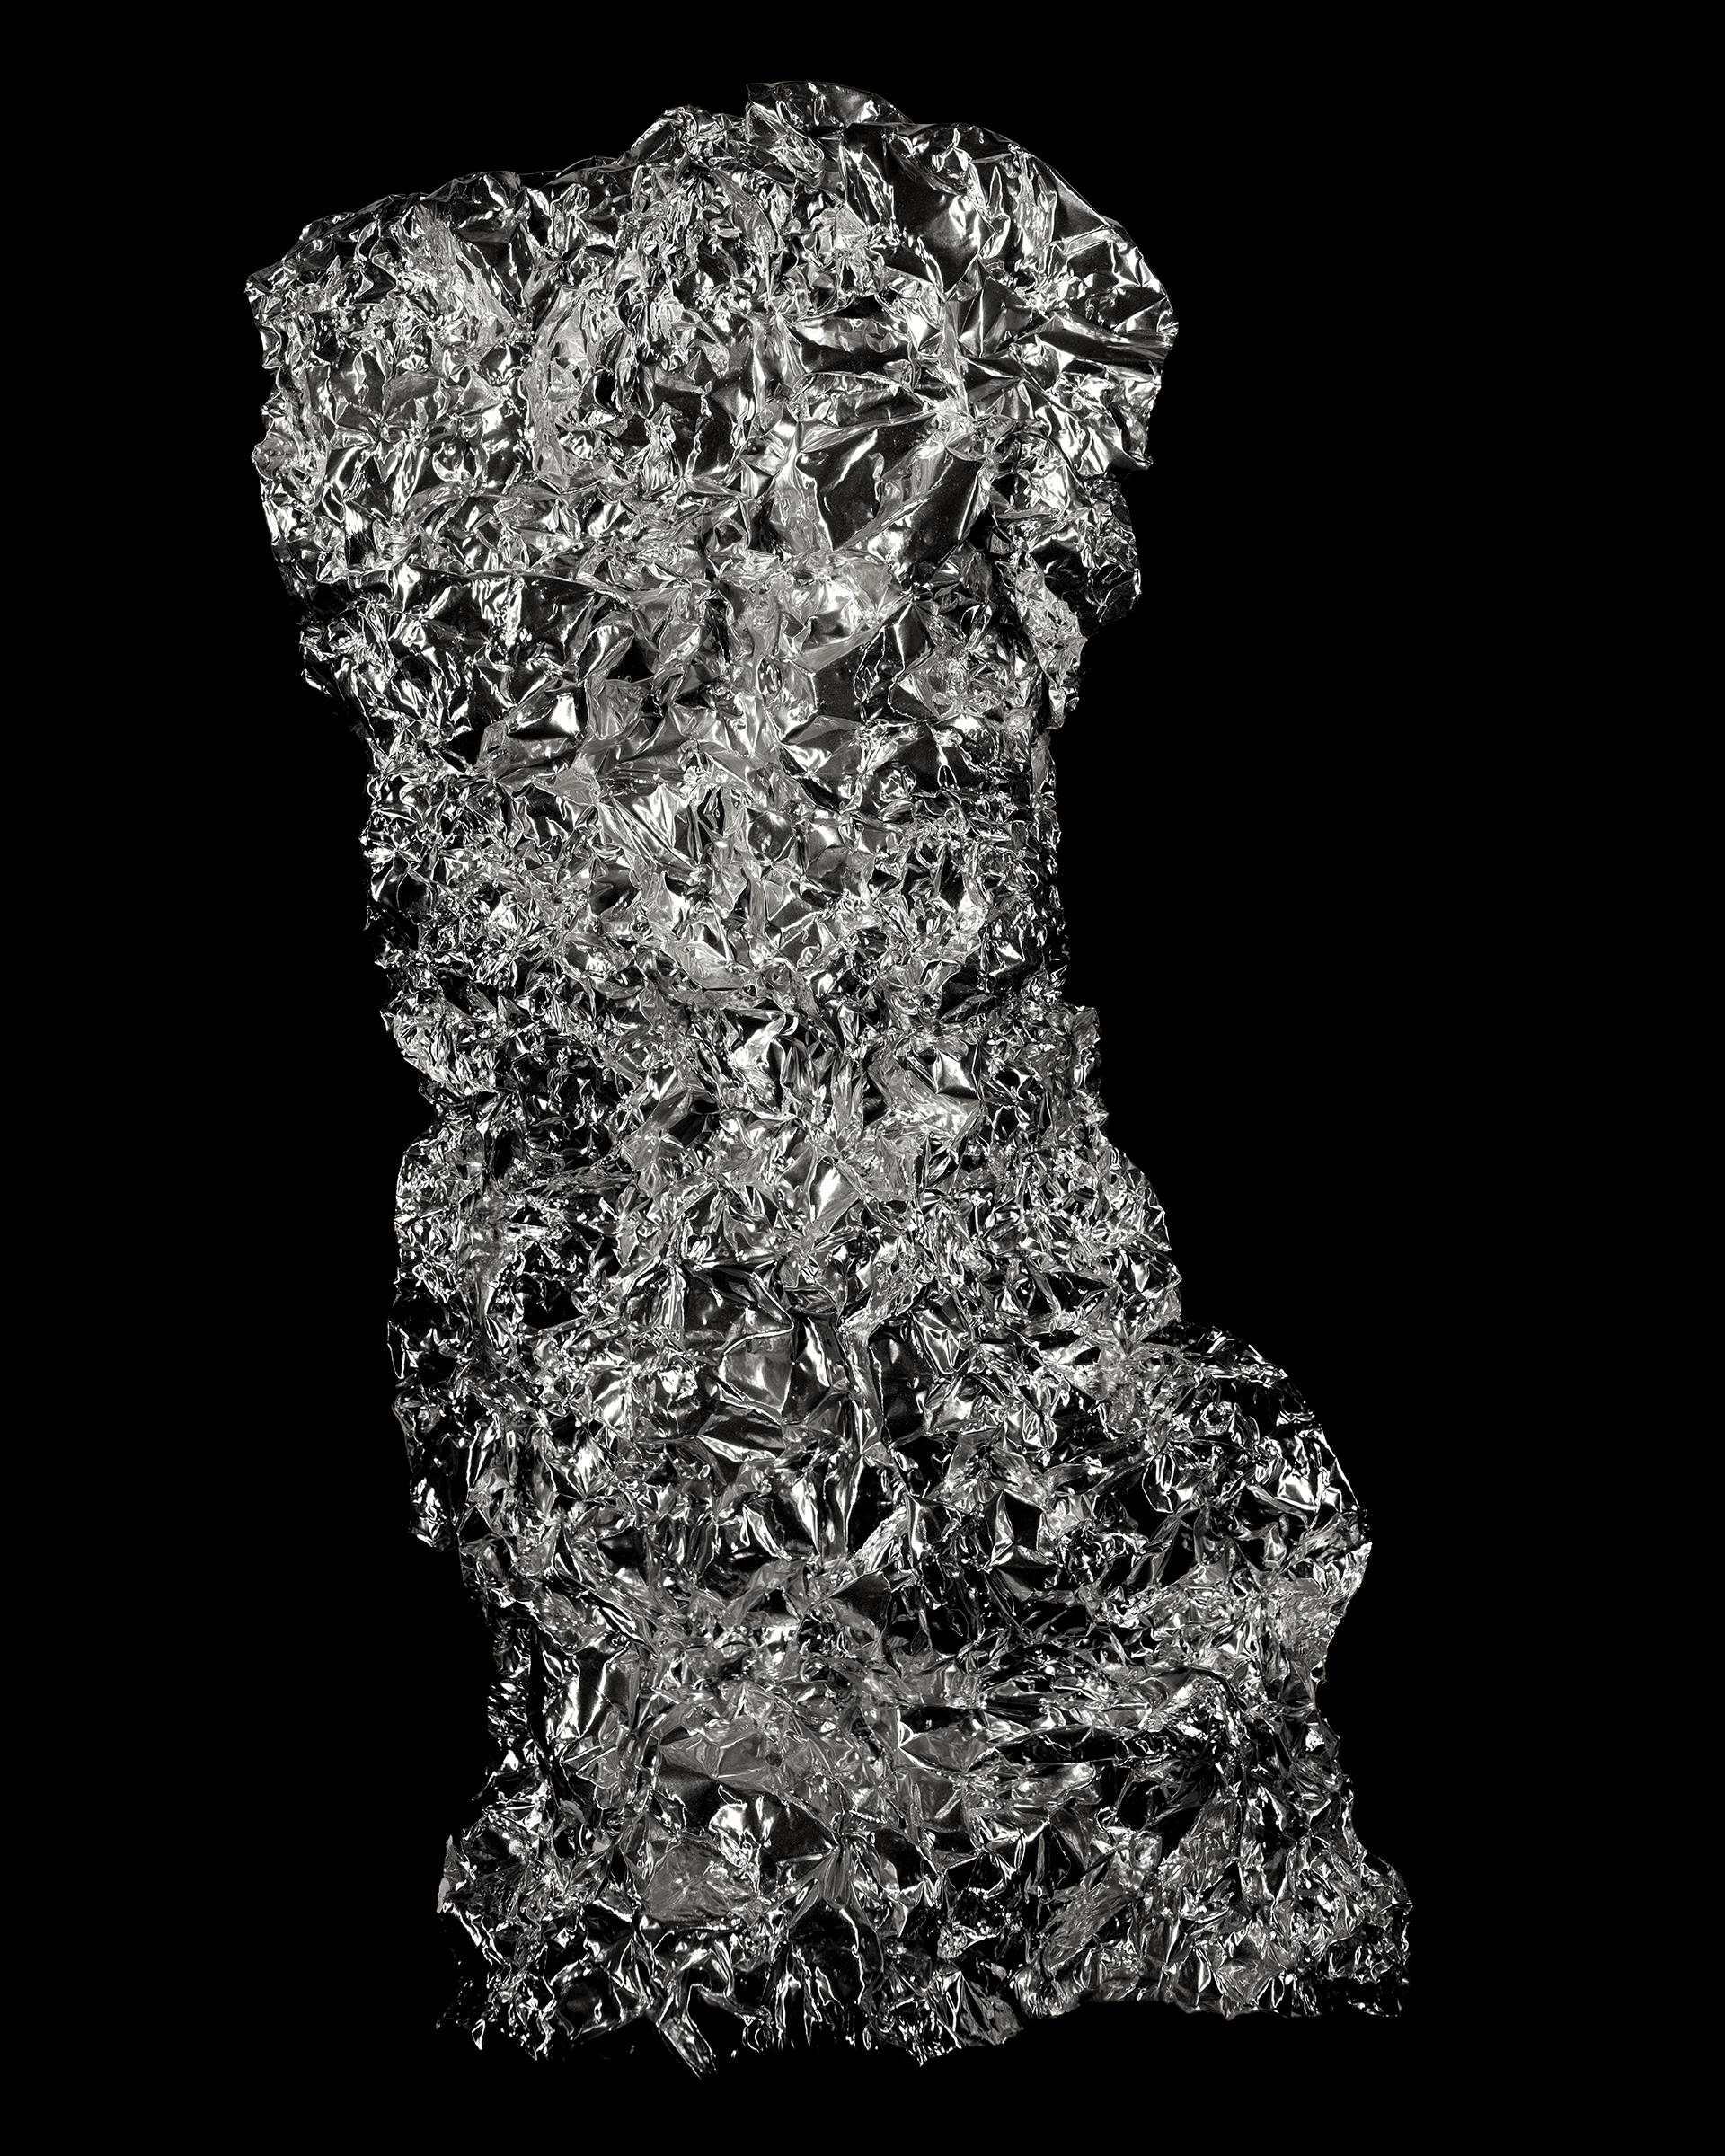 Torso,C-Print, 35 x 28 inches, 2014